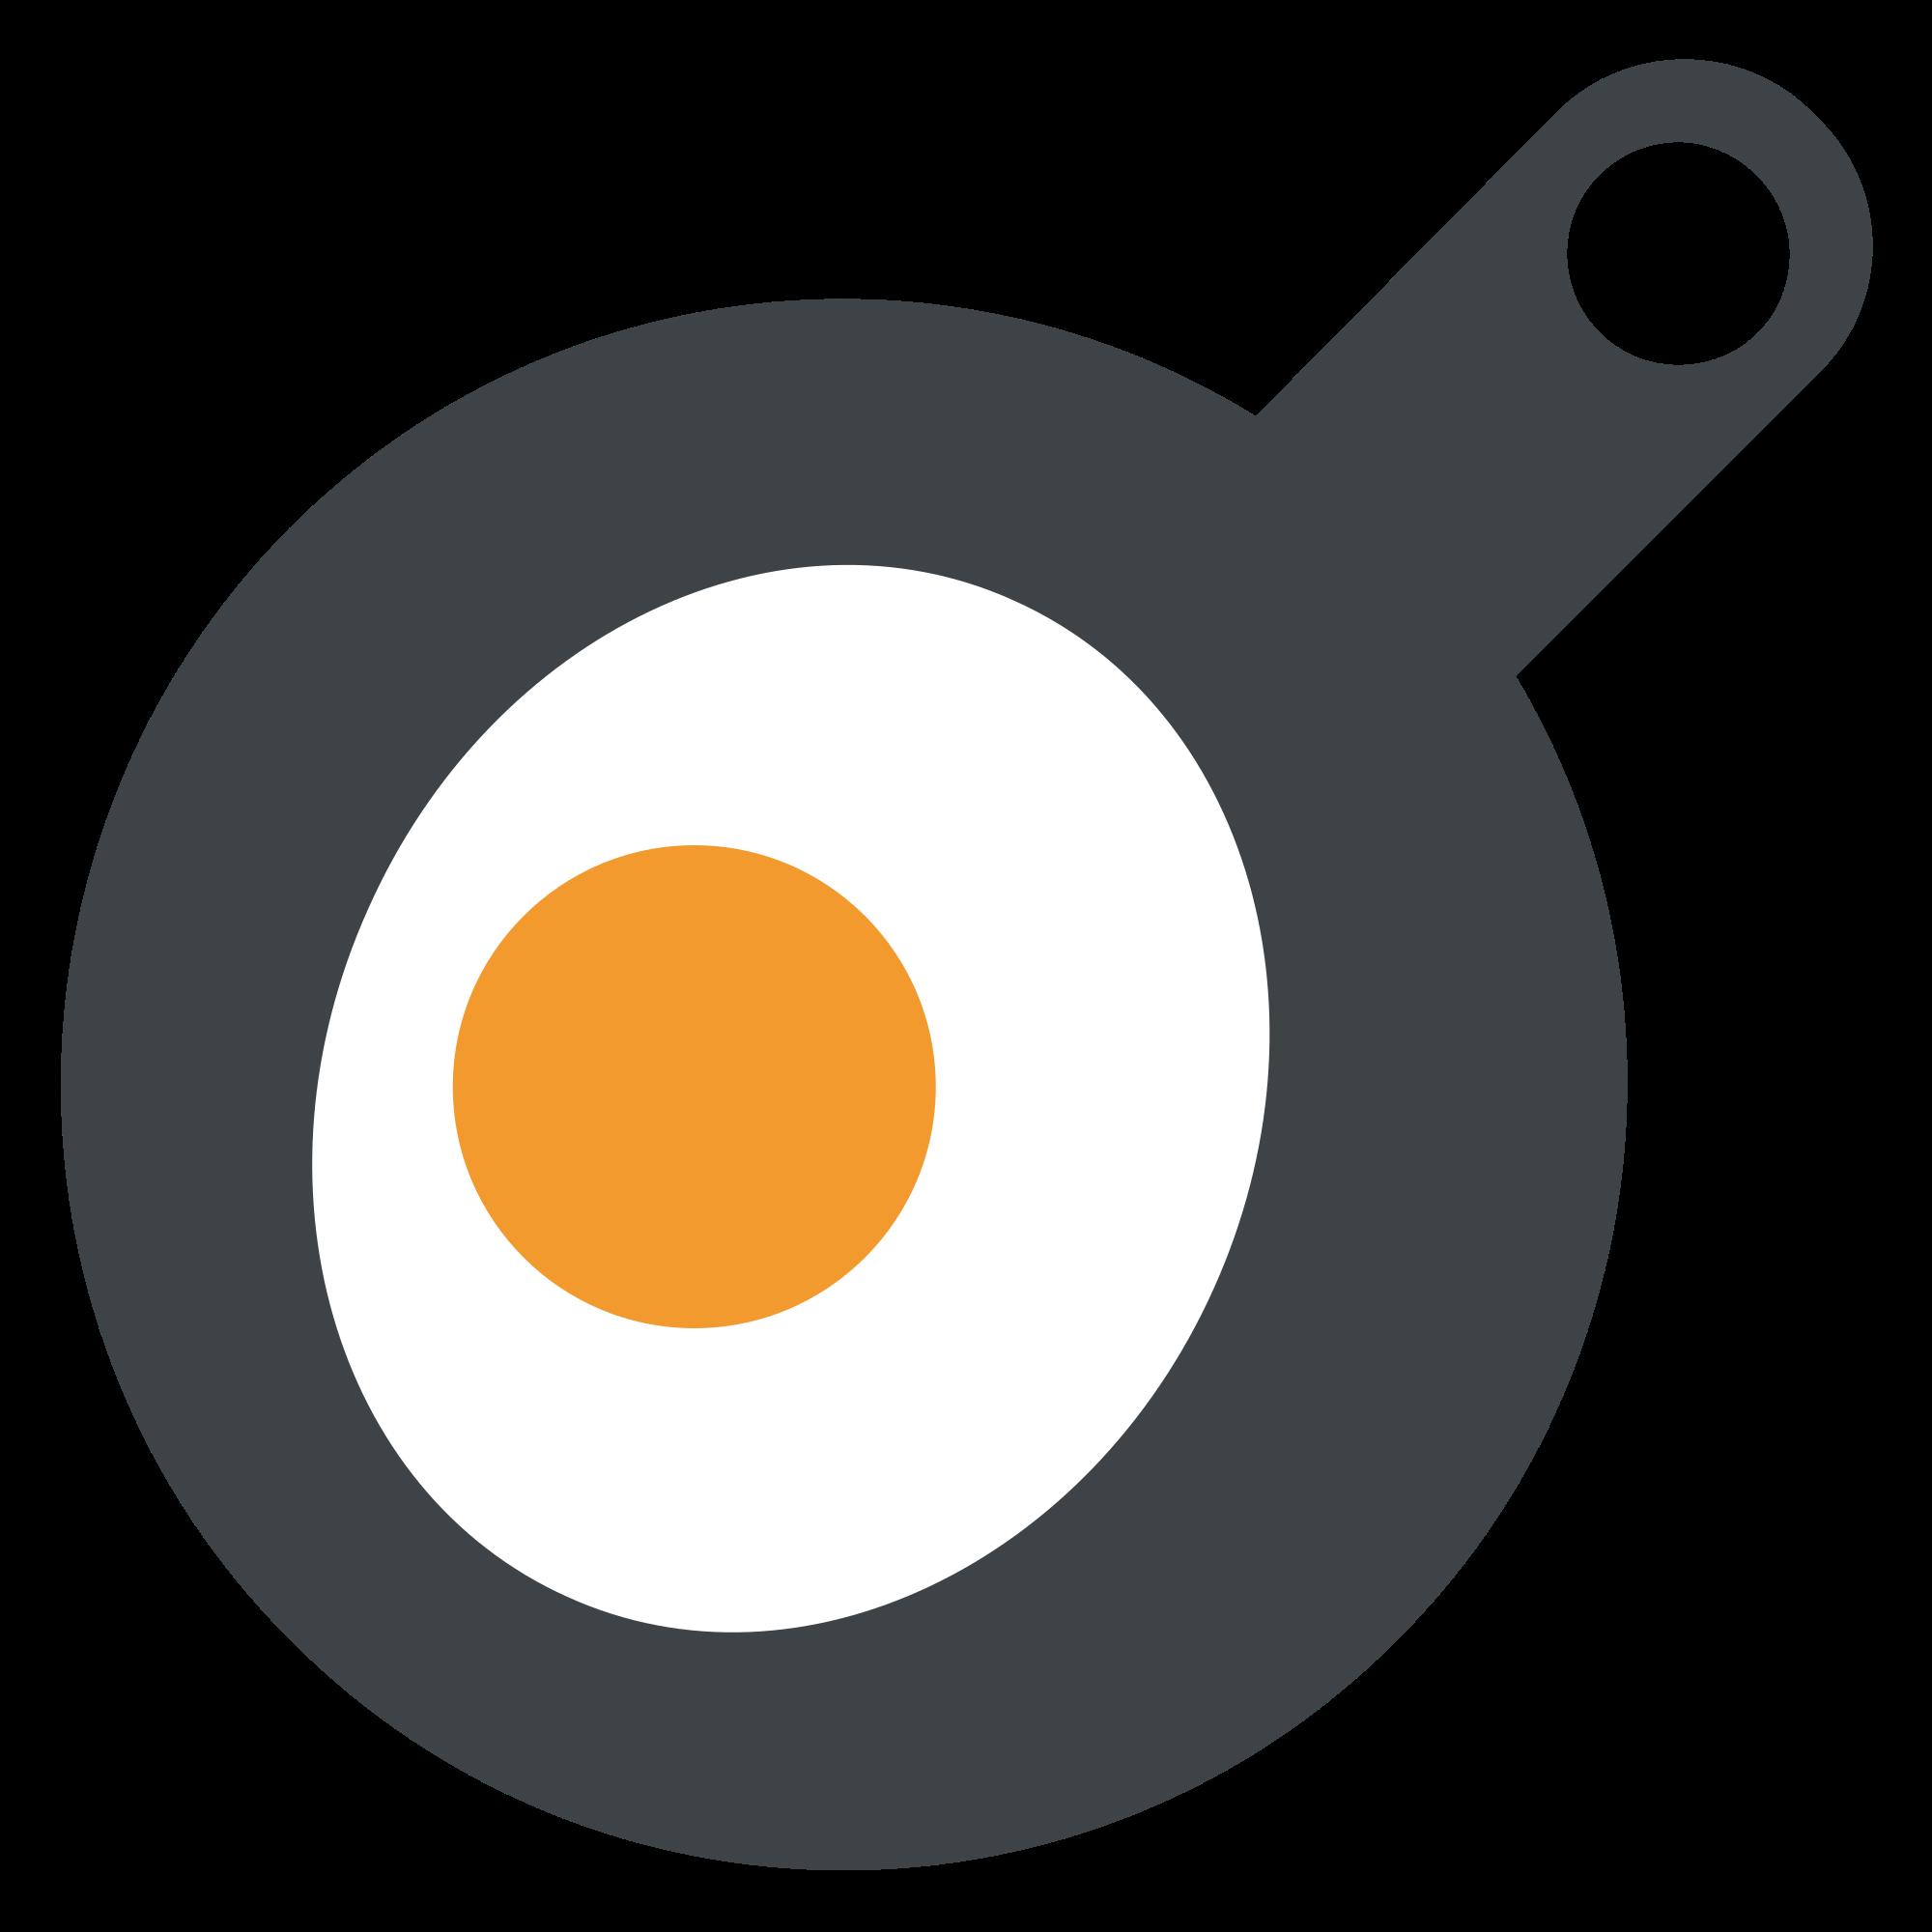 Emoji clipart fry. File emojione f svg